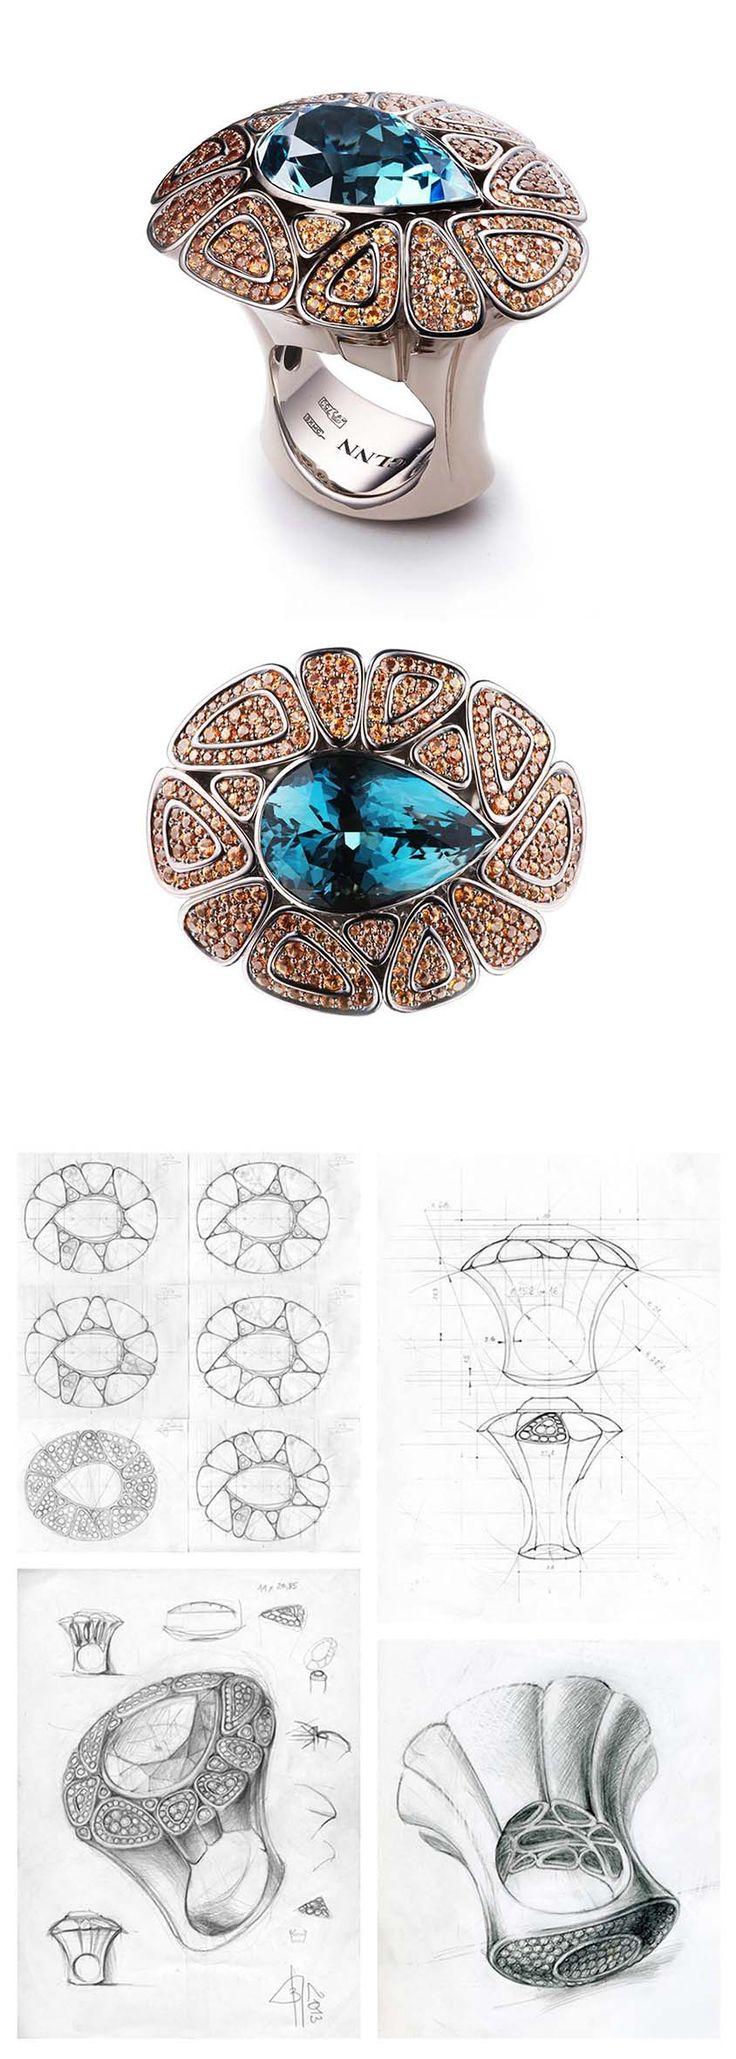 "VLAD GLYNIN jewellery - Ring ""Lake"", 2013. White gold, tourmaline, sapphires / Кольцо ""Озеро"", 2013 г. Белое золото, турмалин, сапфиры / Anello ""Lago"", 2013. Oro bianco, tormaline, zaffiri"